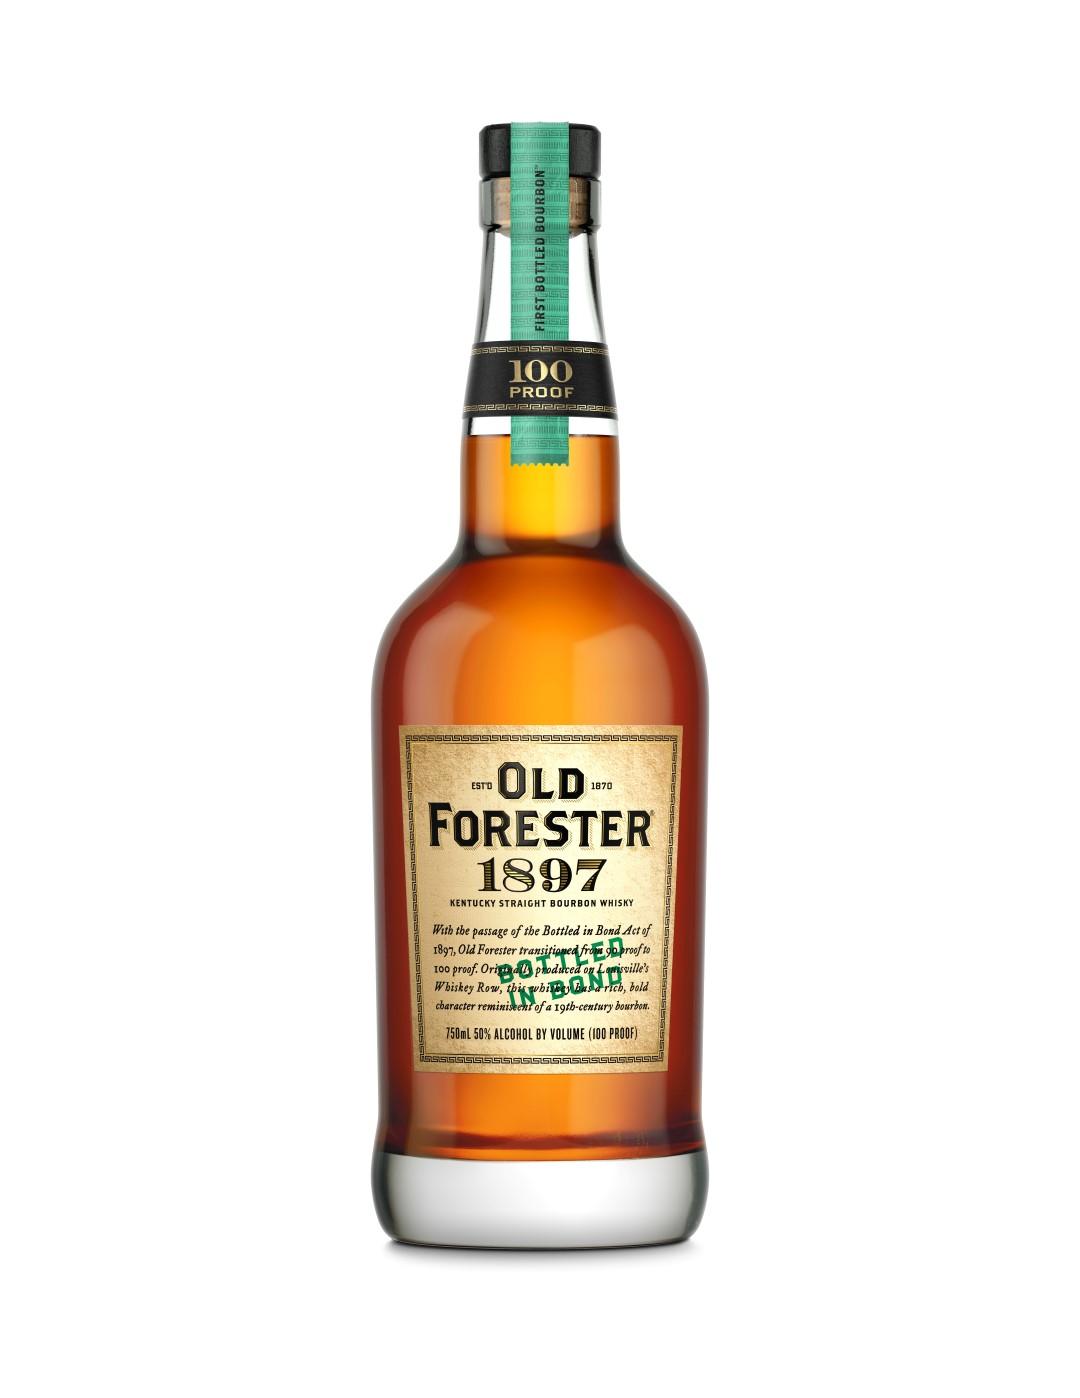 Old Forester Whiskey Row Series – 1897 Bottled in Bond Bourbon